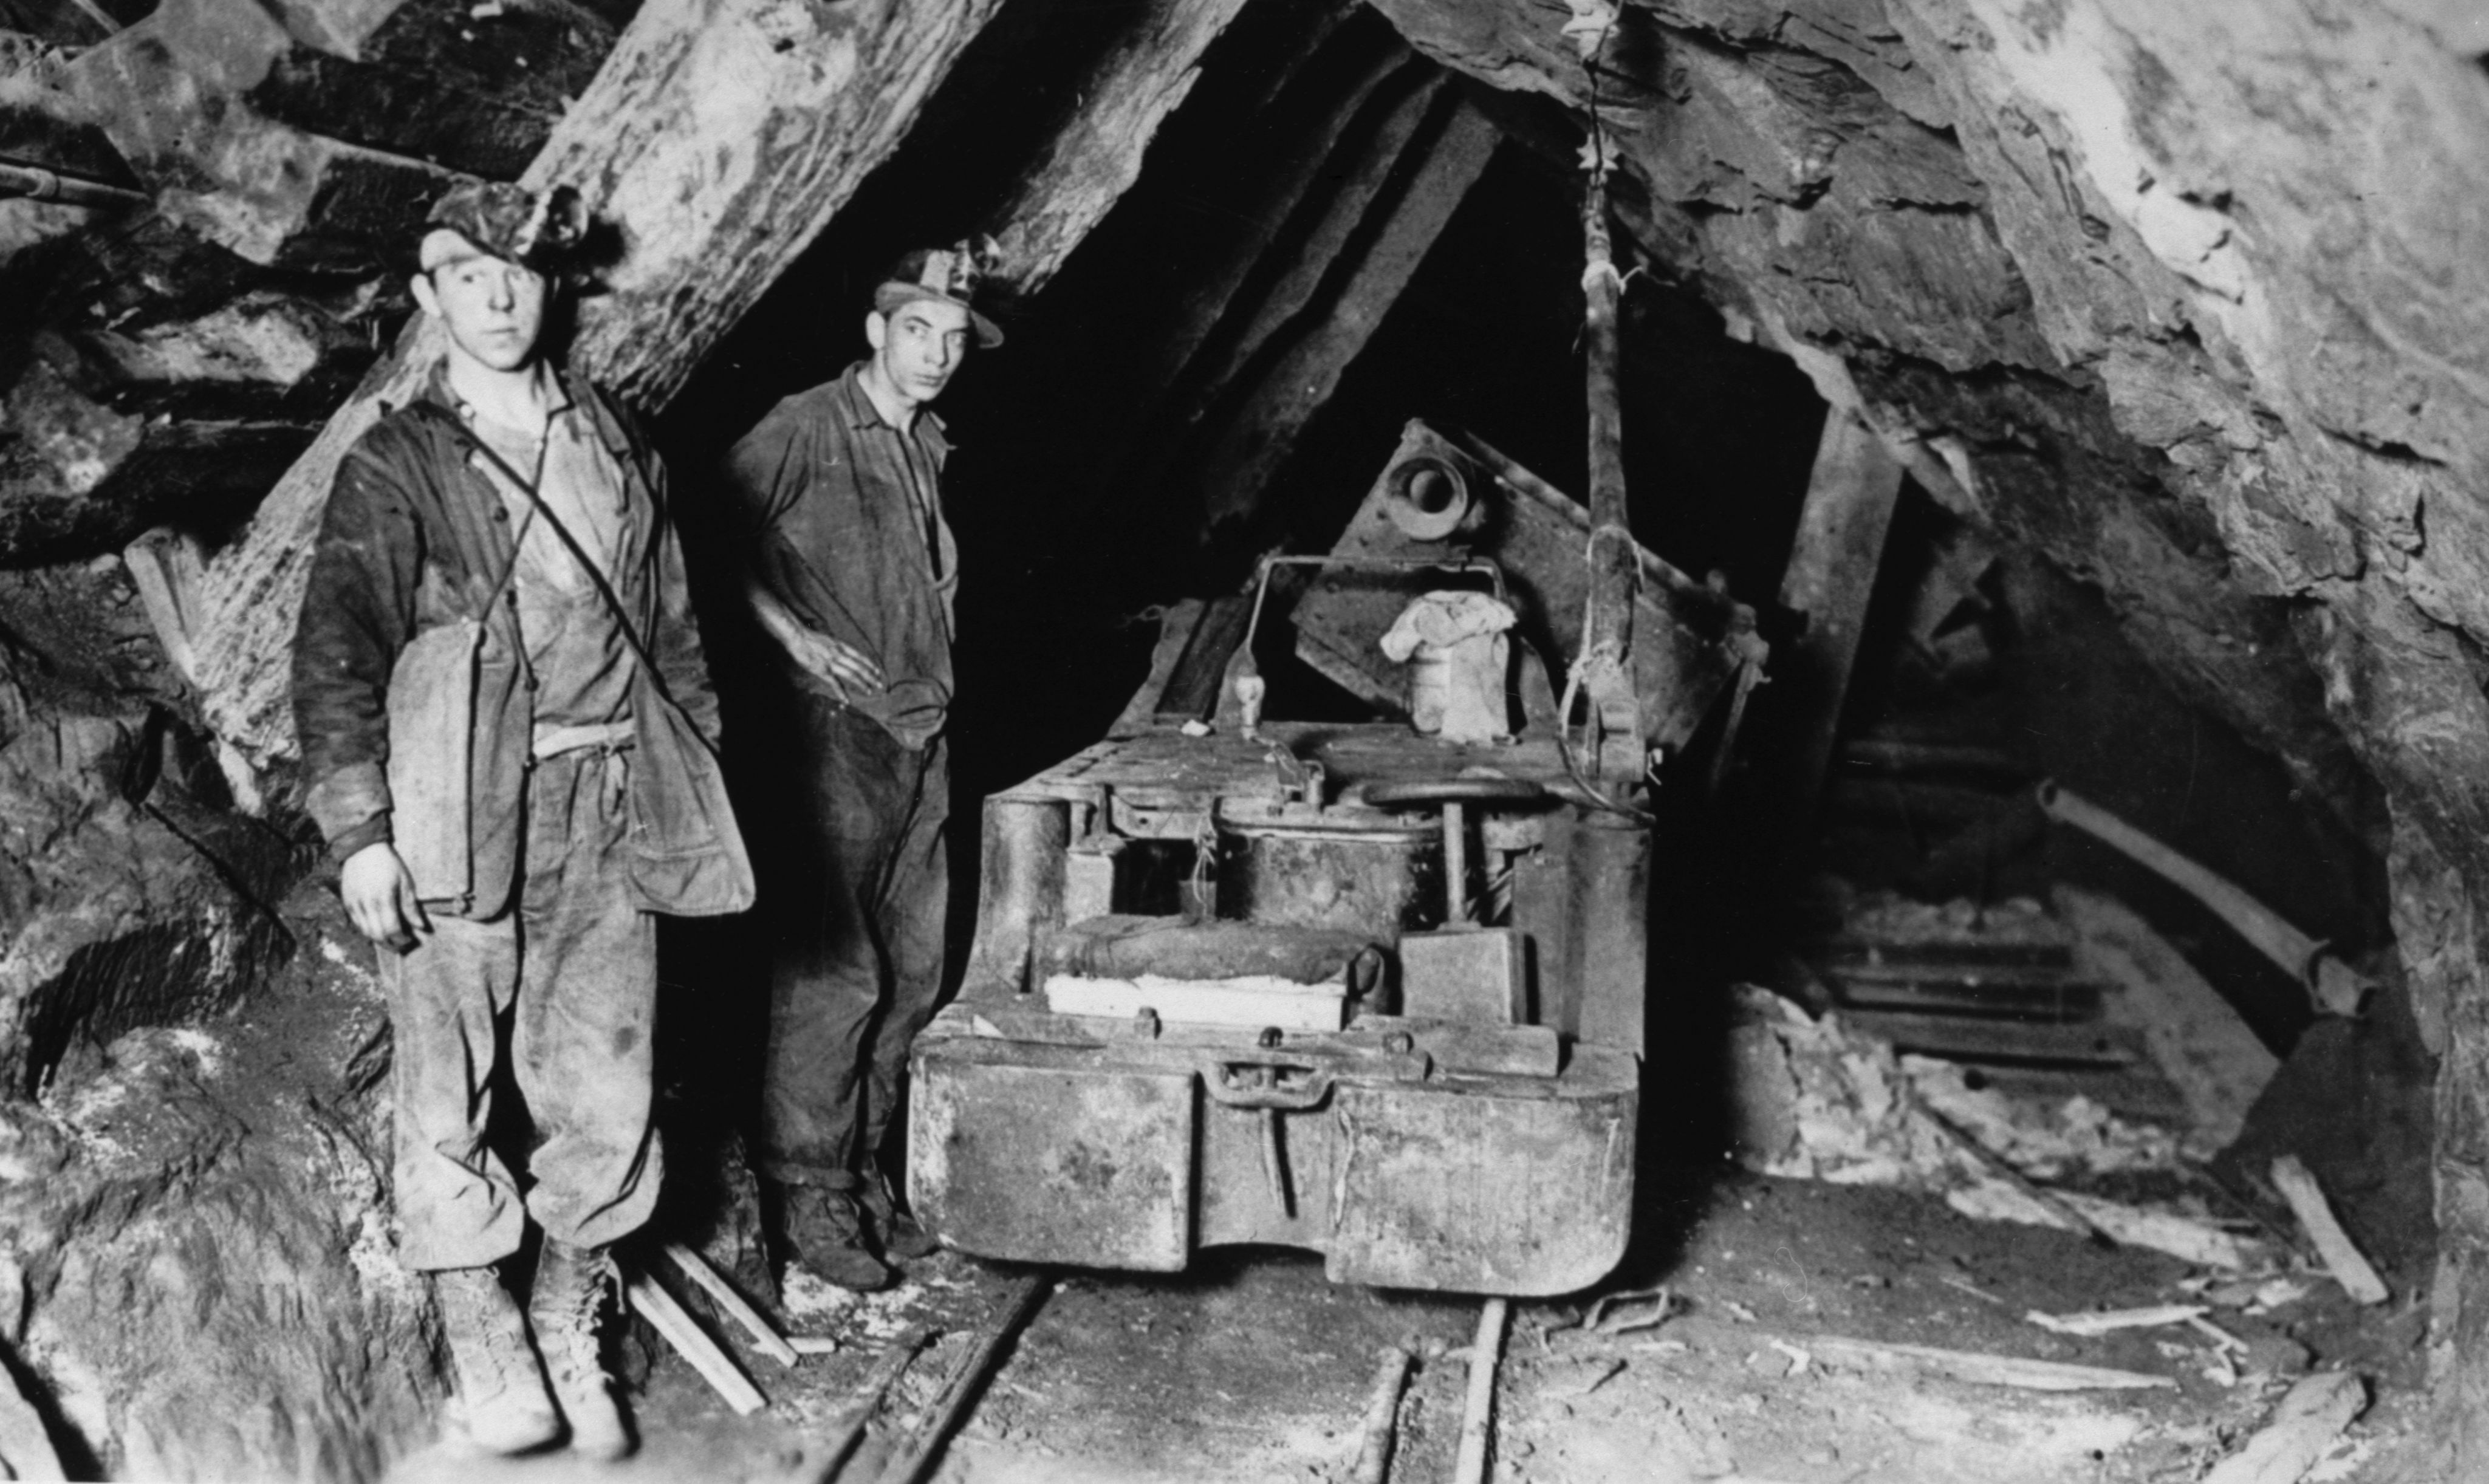 Bestand:Quincy Mining Company Locomotive 1920.jpg - Wikipedia